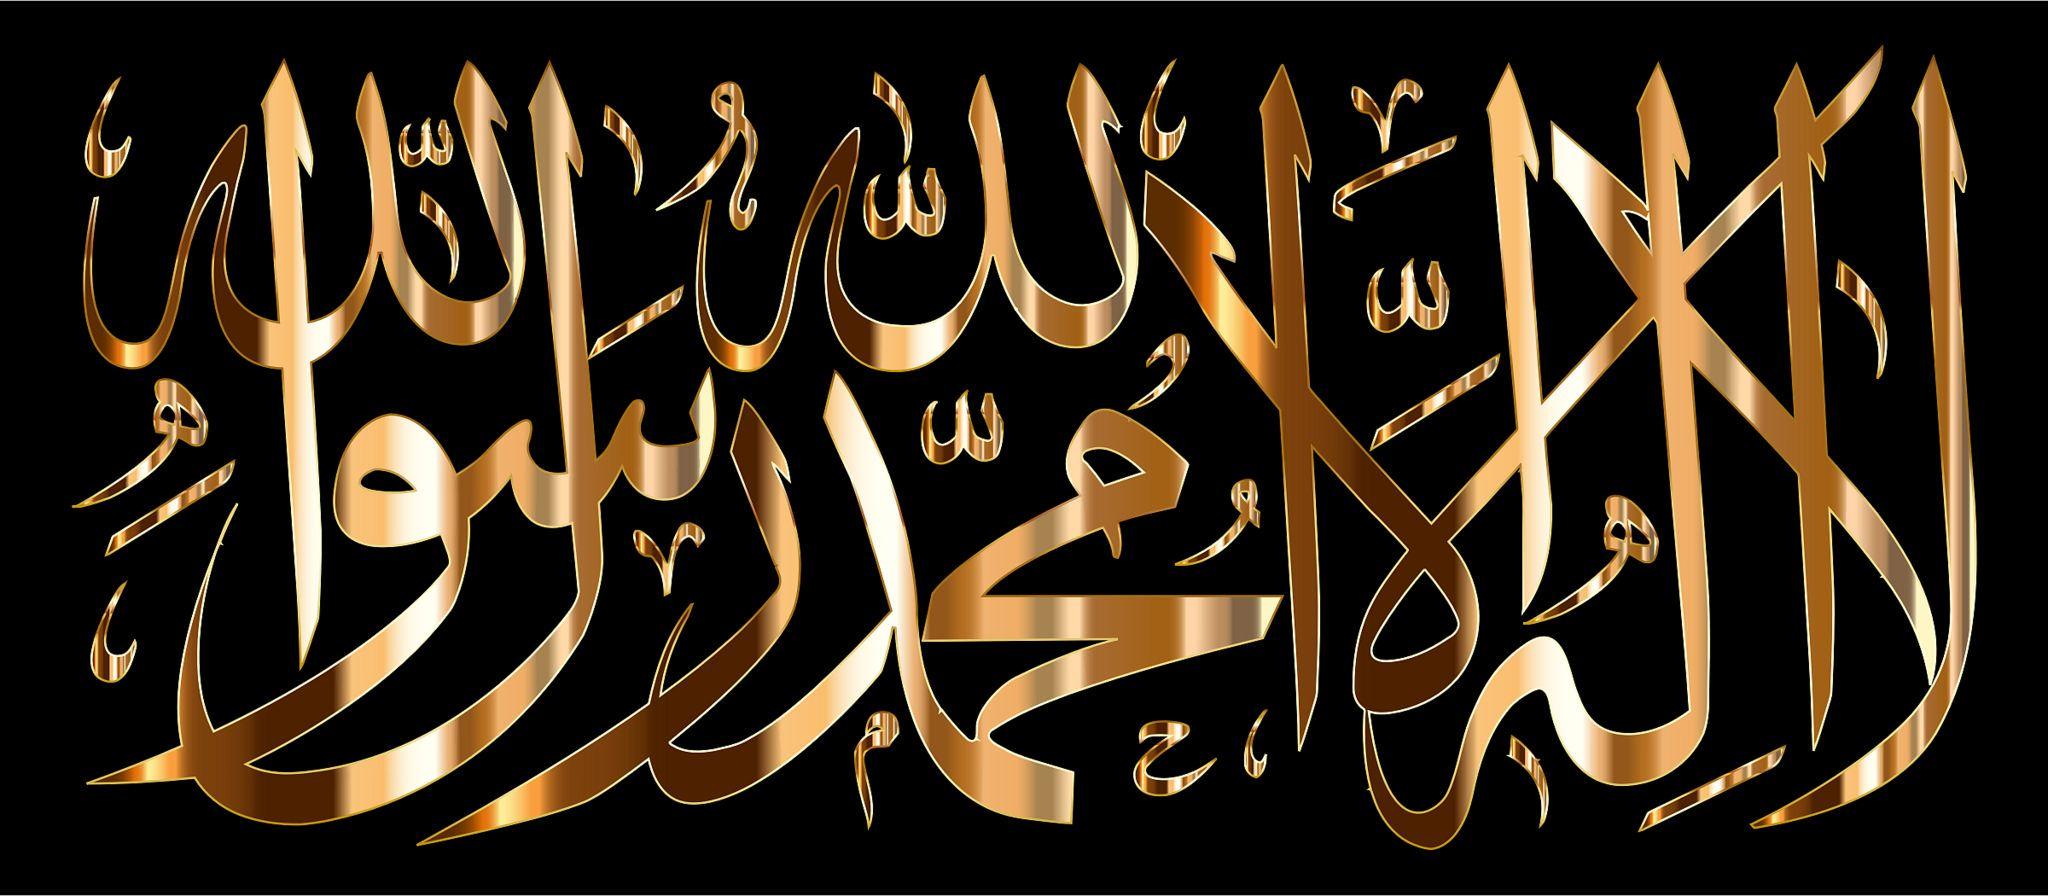 Gold Shahada Calligraphy Calligraphy Neon Signs Arabic Calligraphy